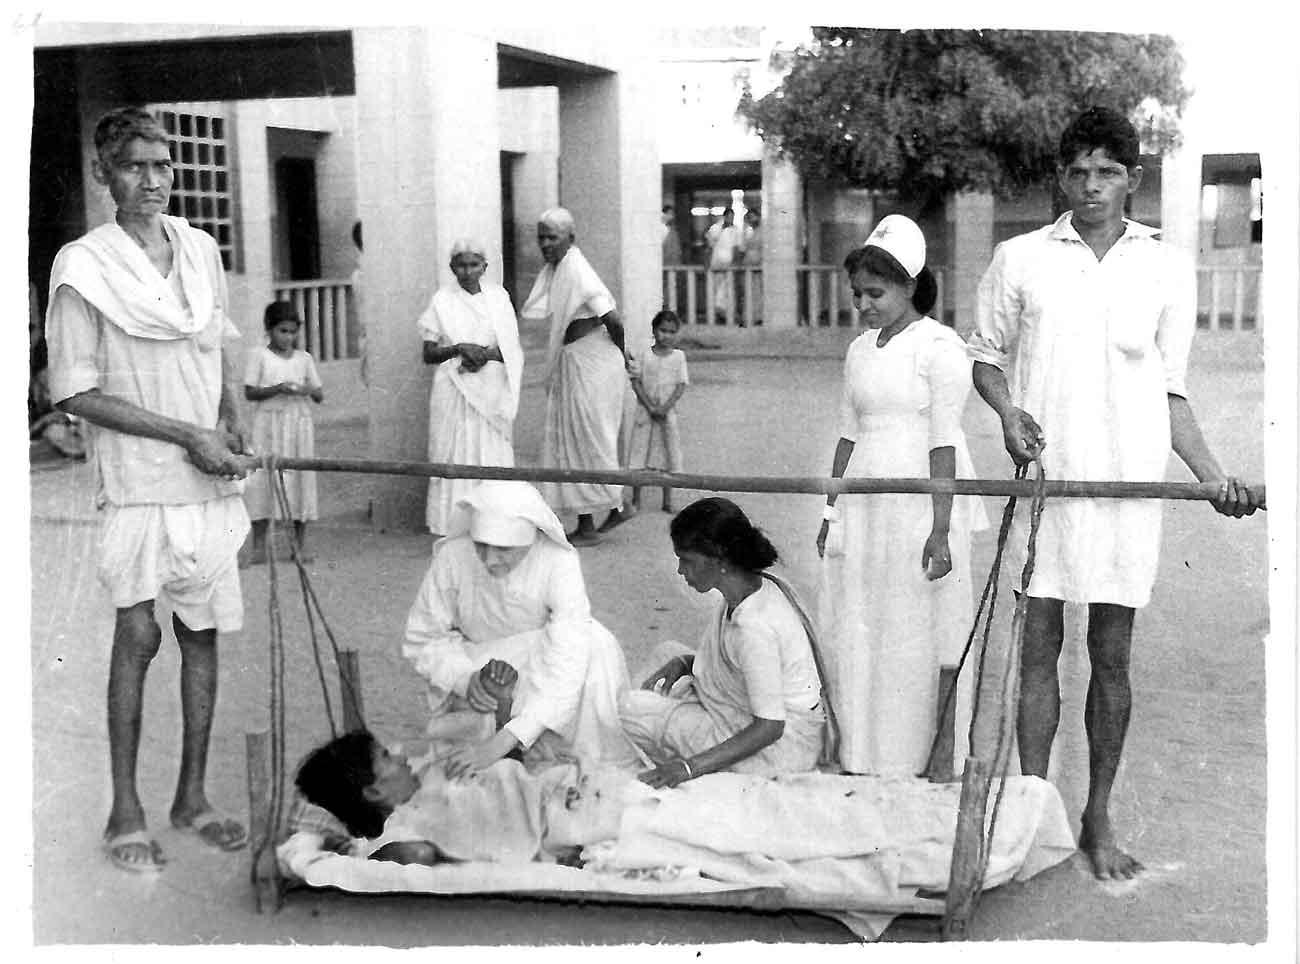 Bhimavaram, India 1965